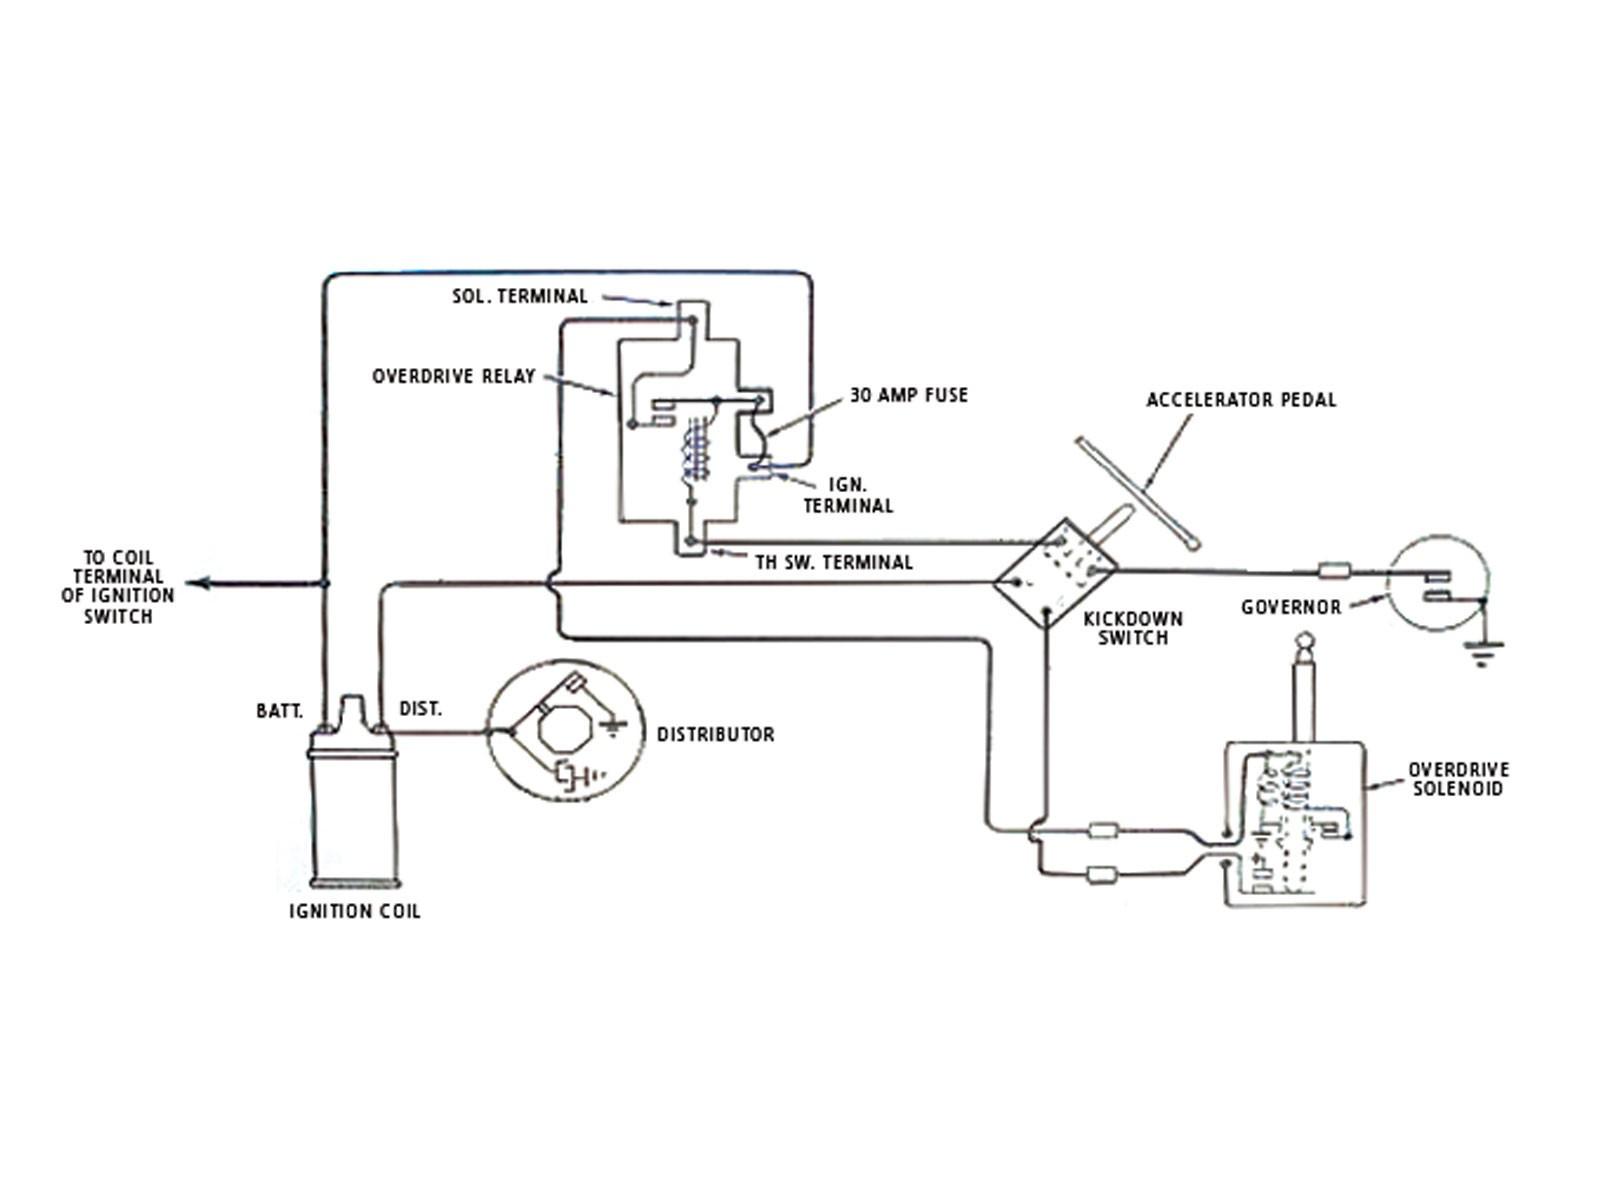 hight resolution of mgb alternator wiring diagram best wiring diagram safety relay best basic od troubleshooting chevytalk